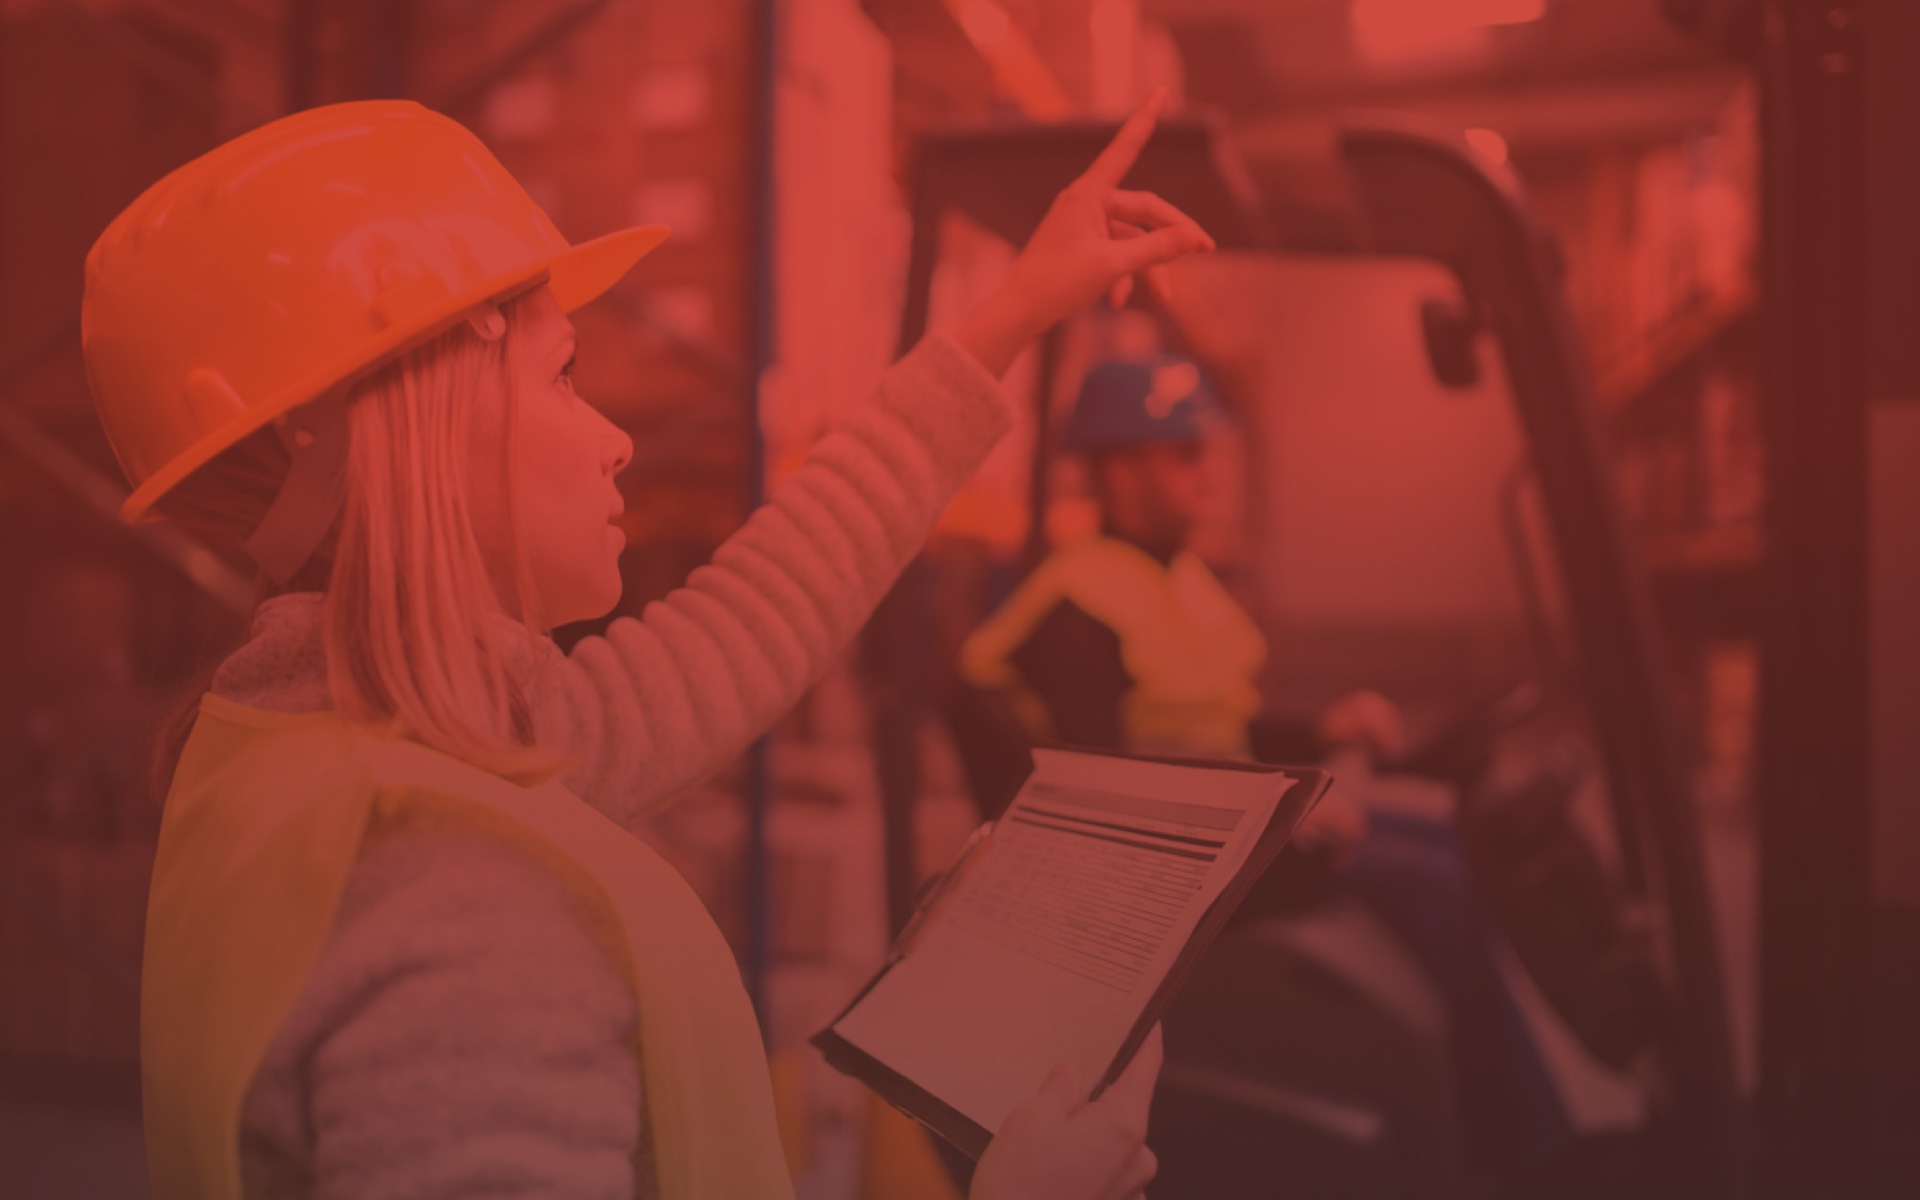 Custom Safety Plan and Program Card